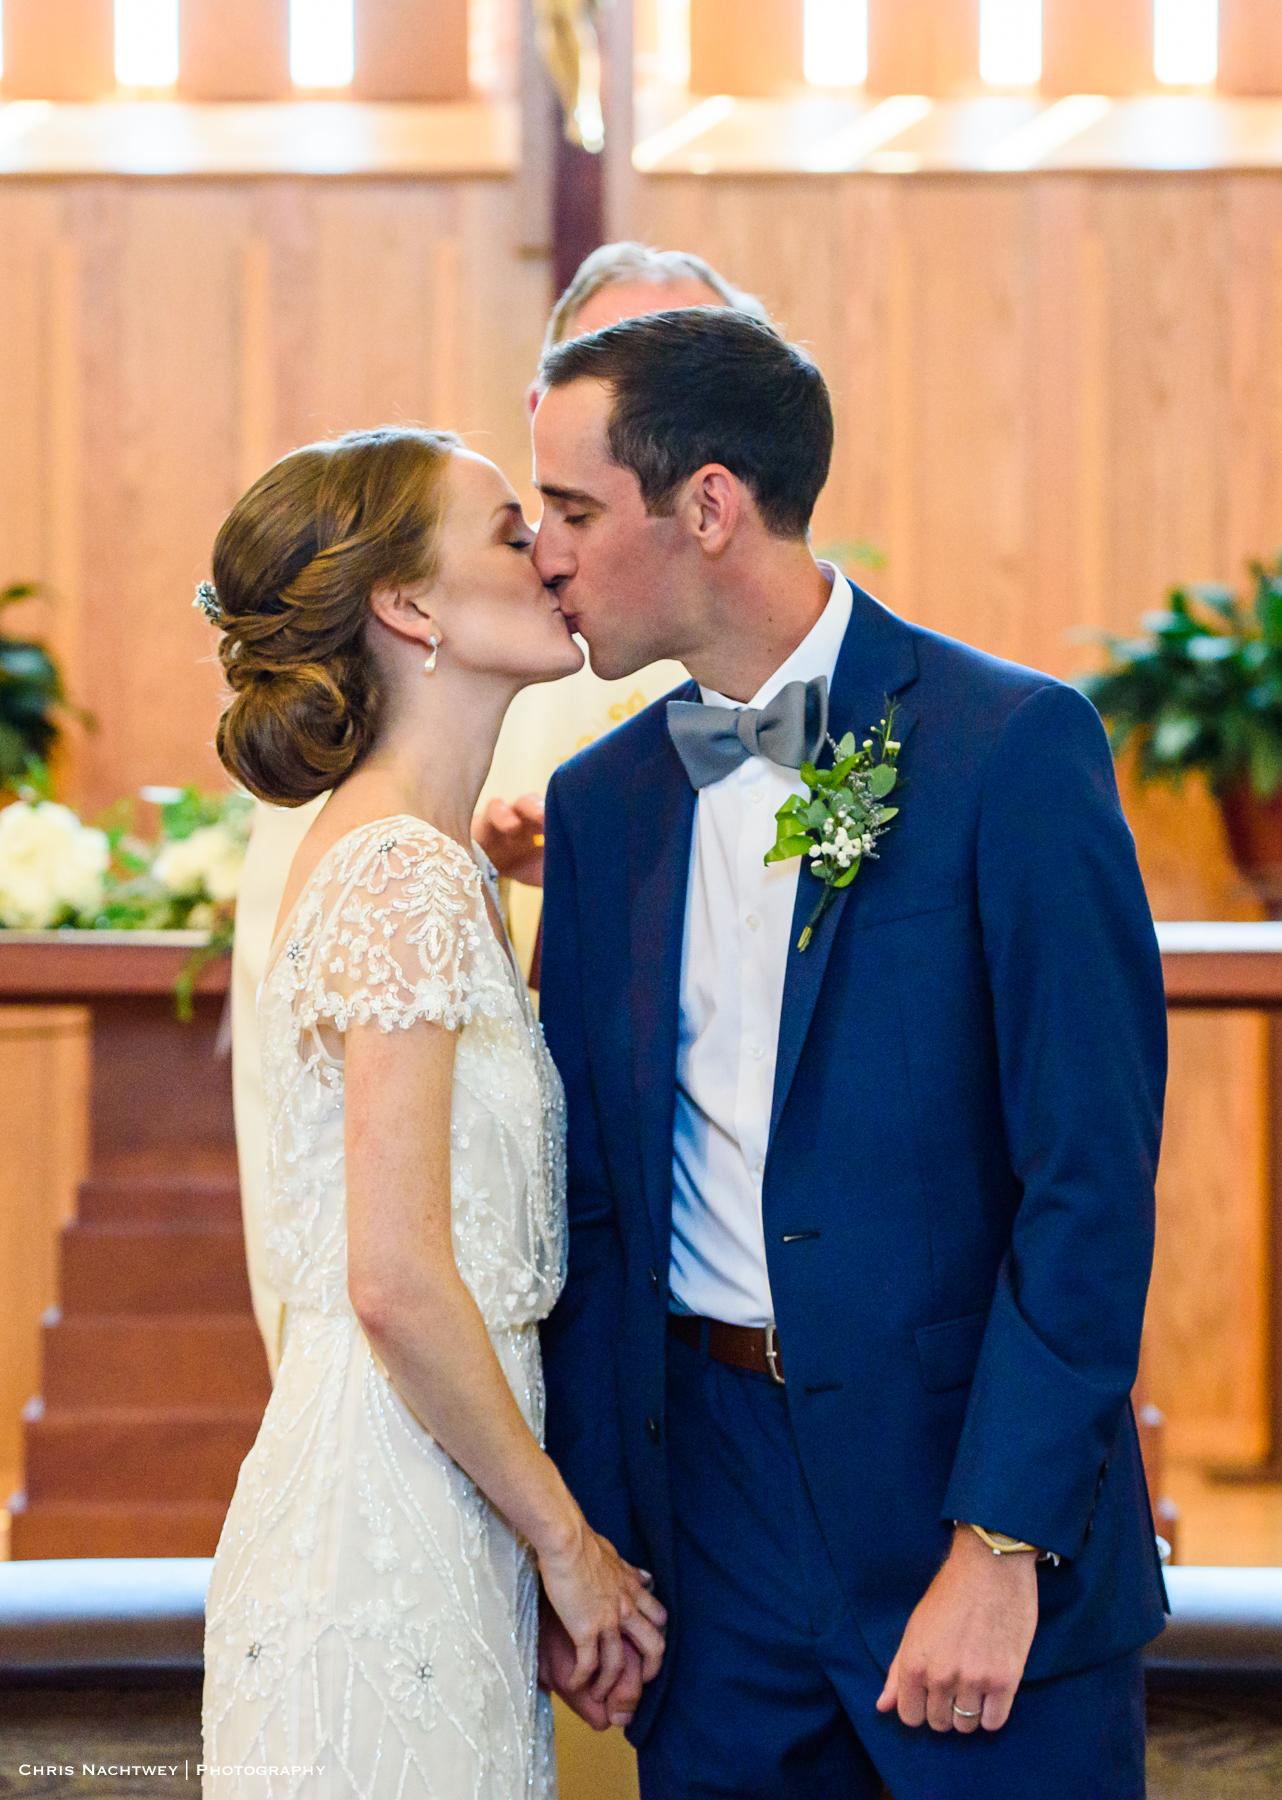 photos-wedding-quidnessett-country-club-ri-chris-nachtwey-photography-2018-26.jpg